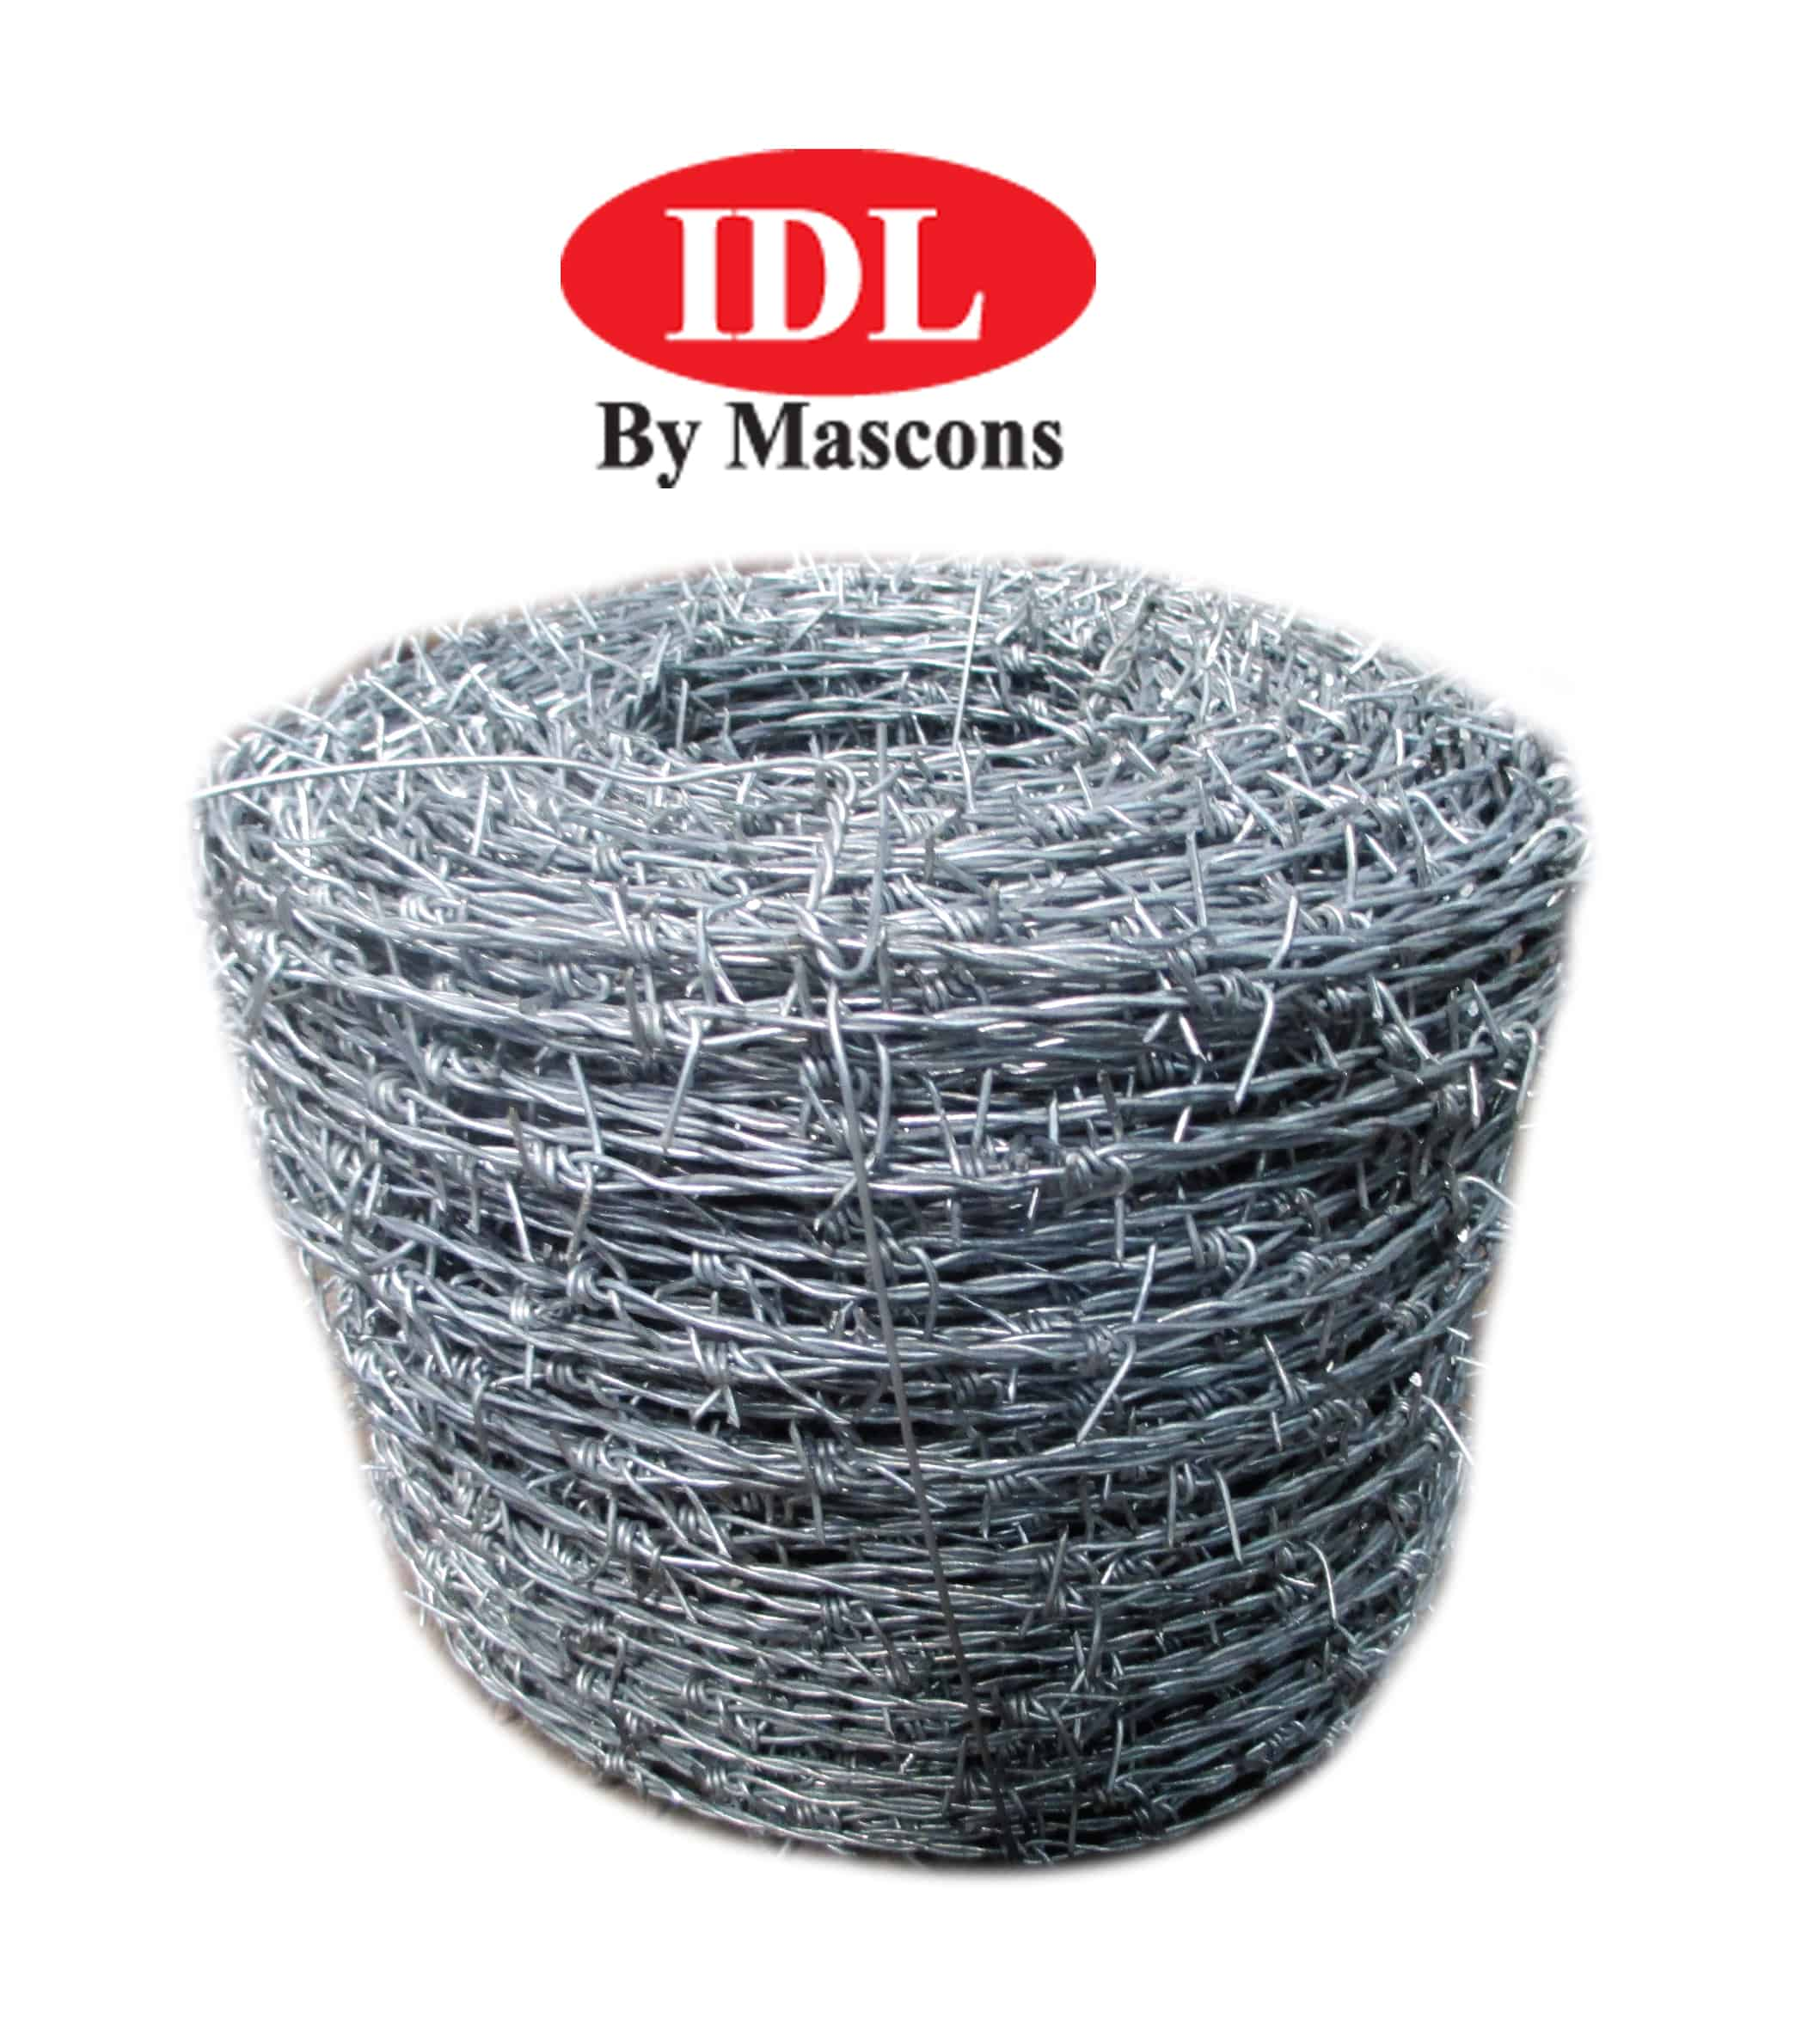 GI Barbed Wire in Sri Lanka